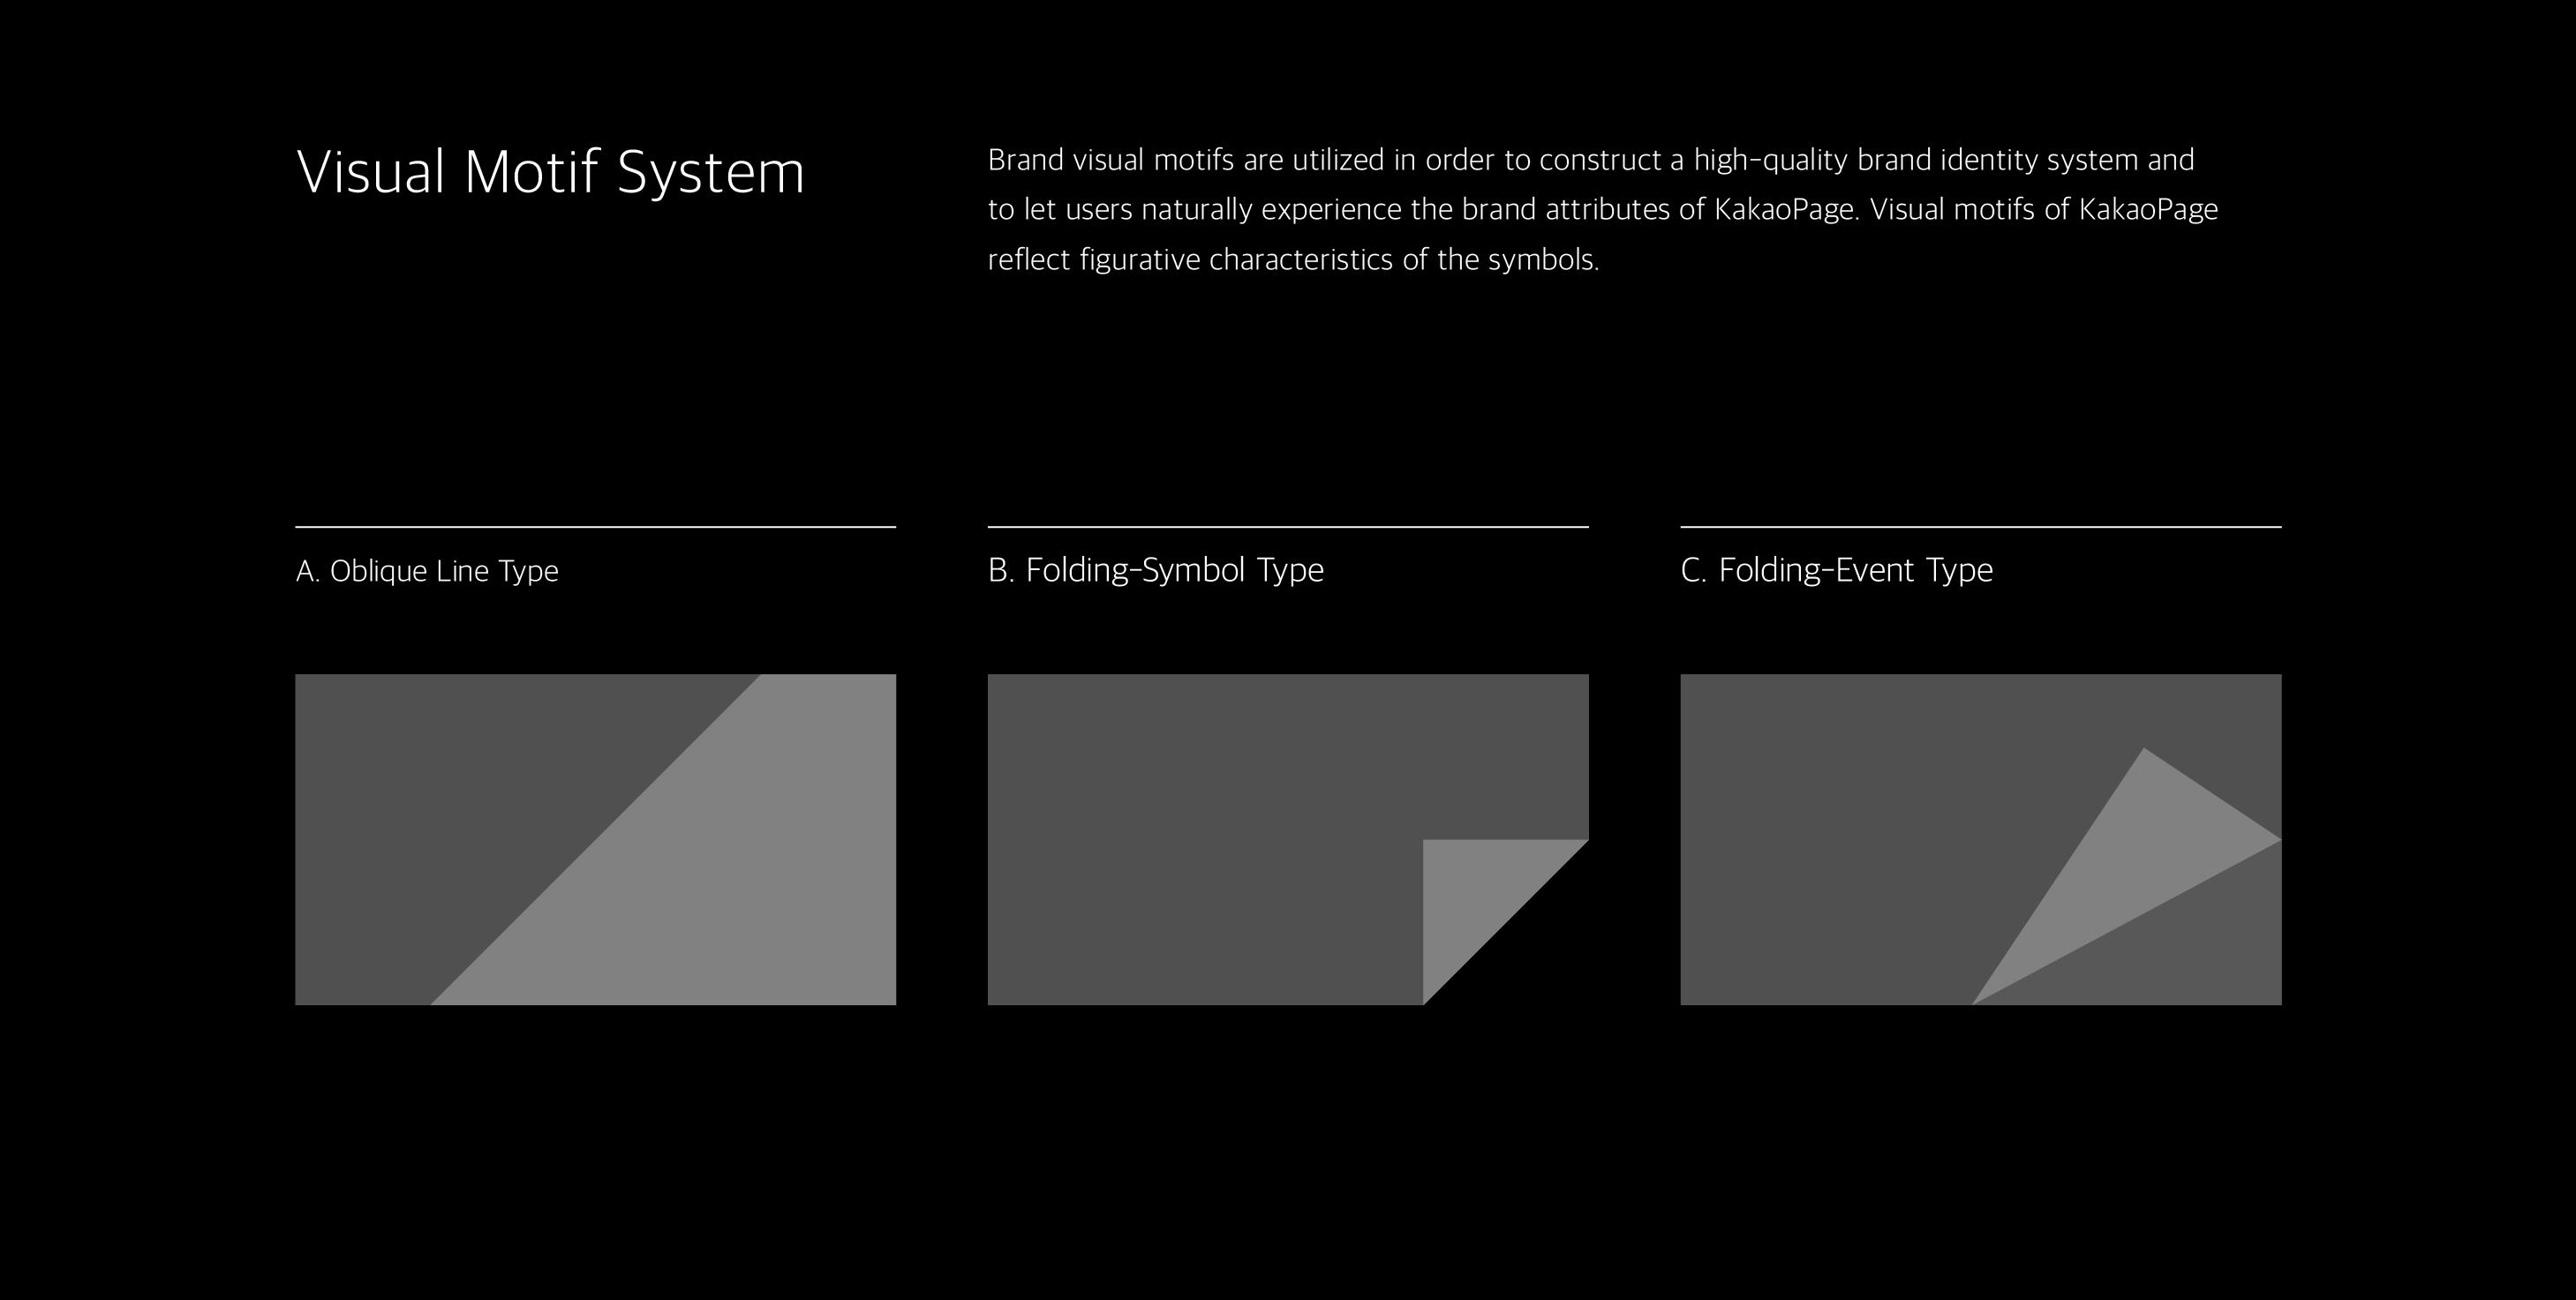 kakaopage-Brand-eXperience-Design-Renewal-12